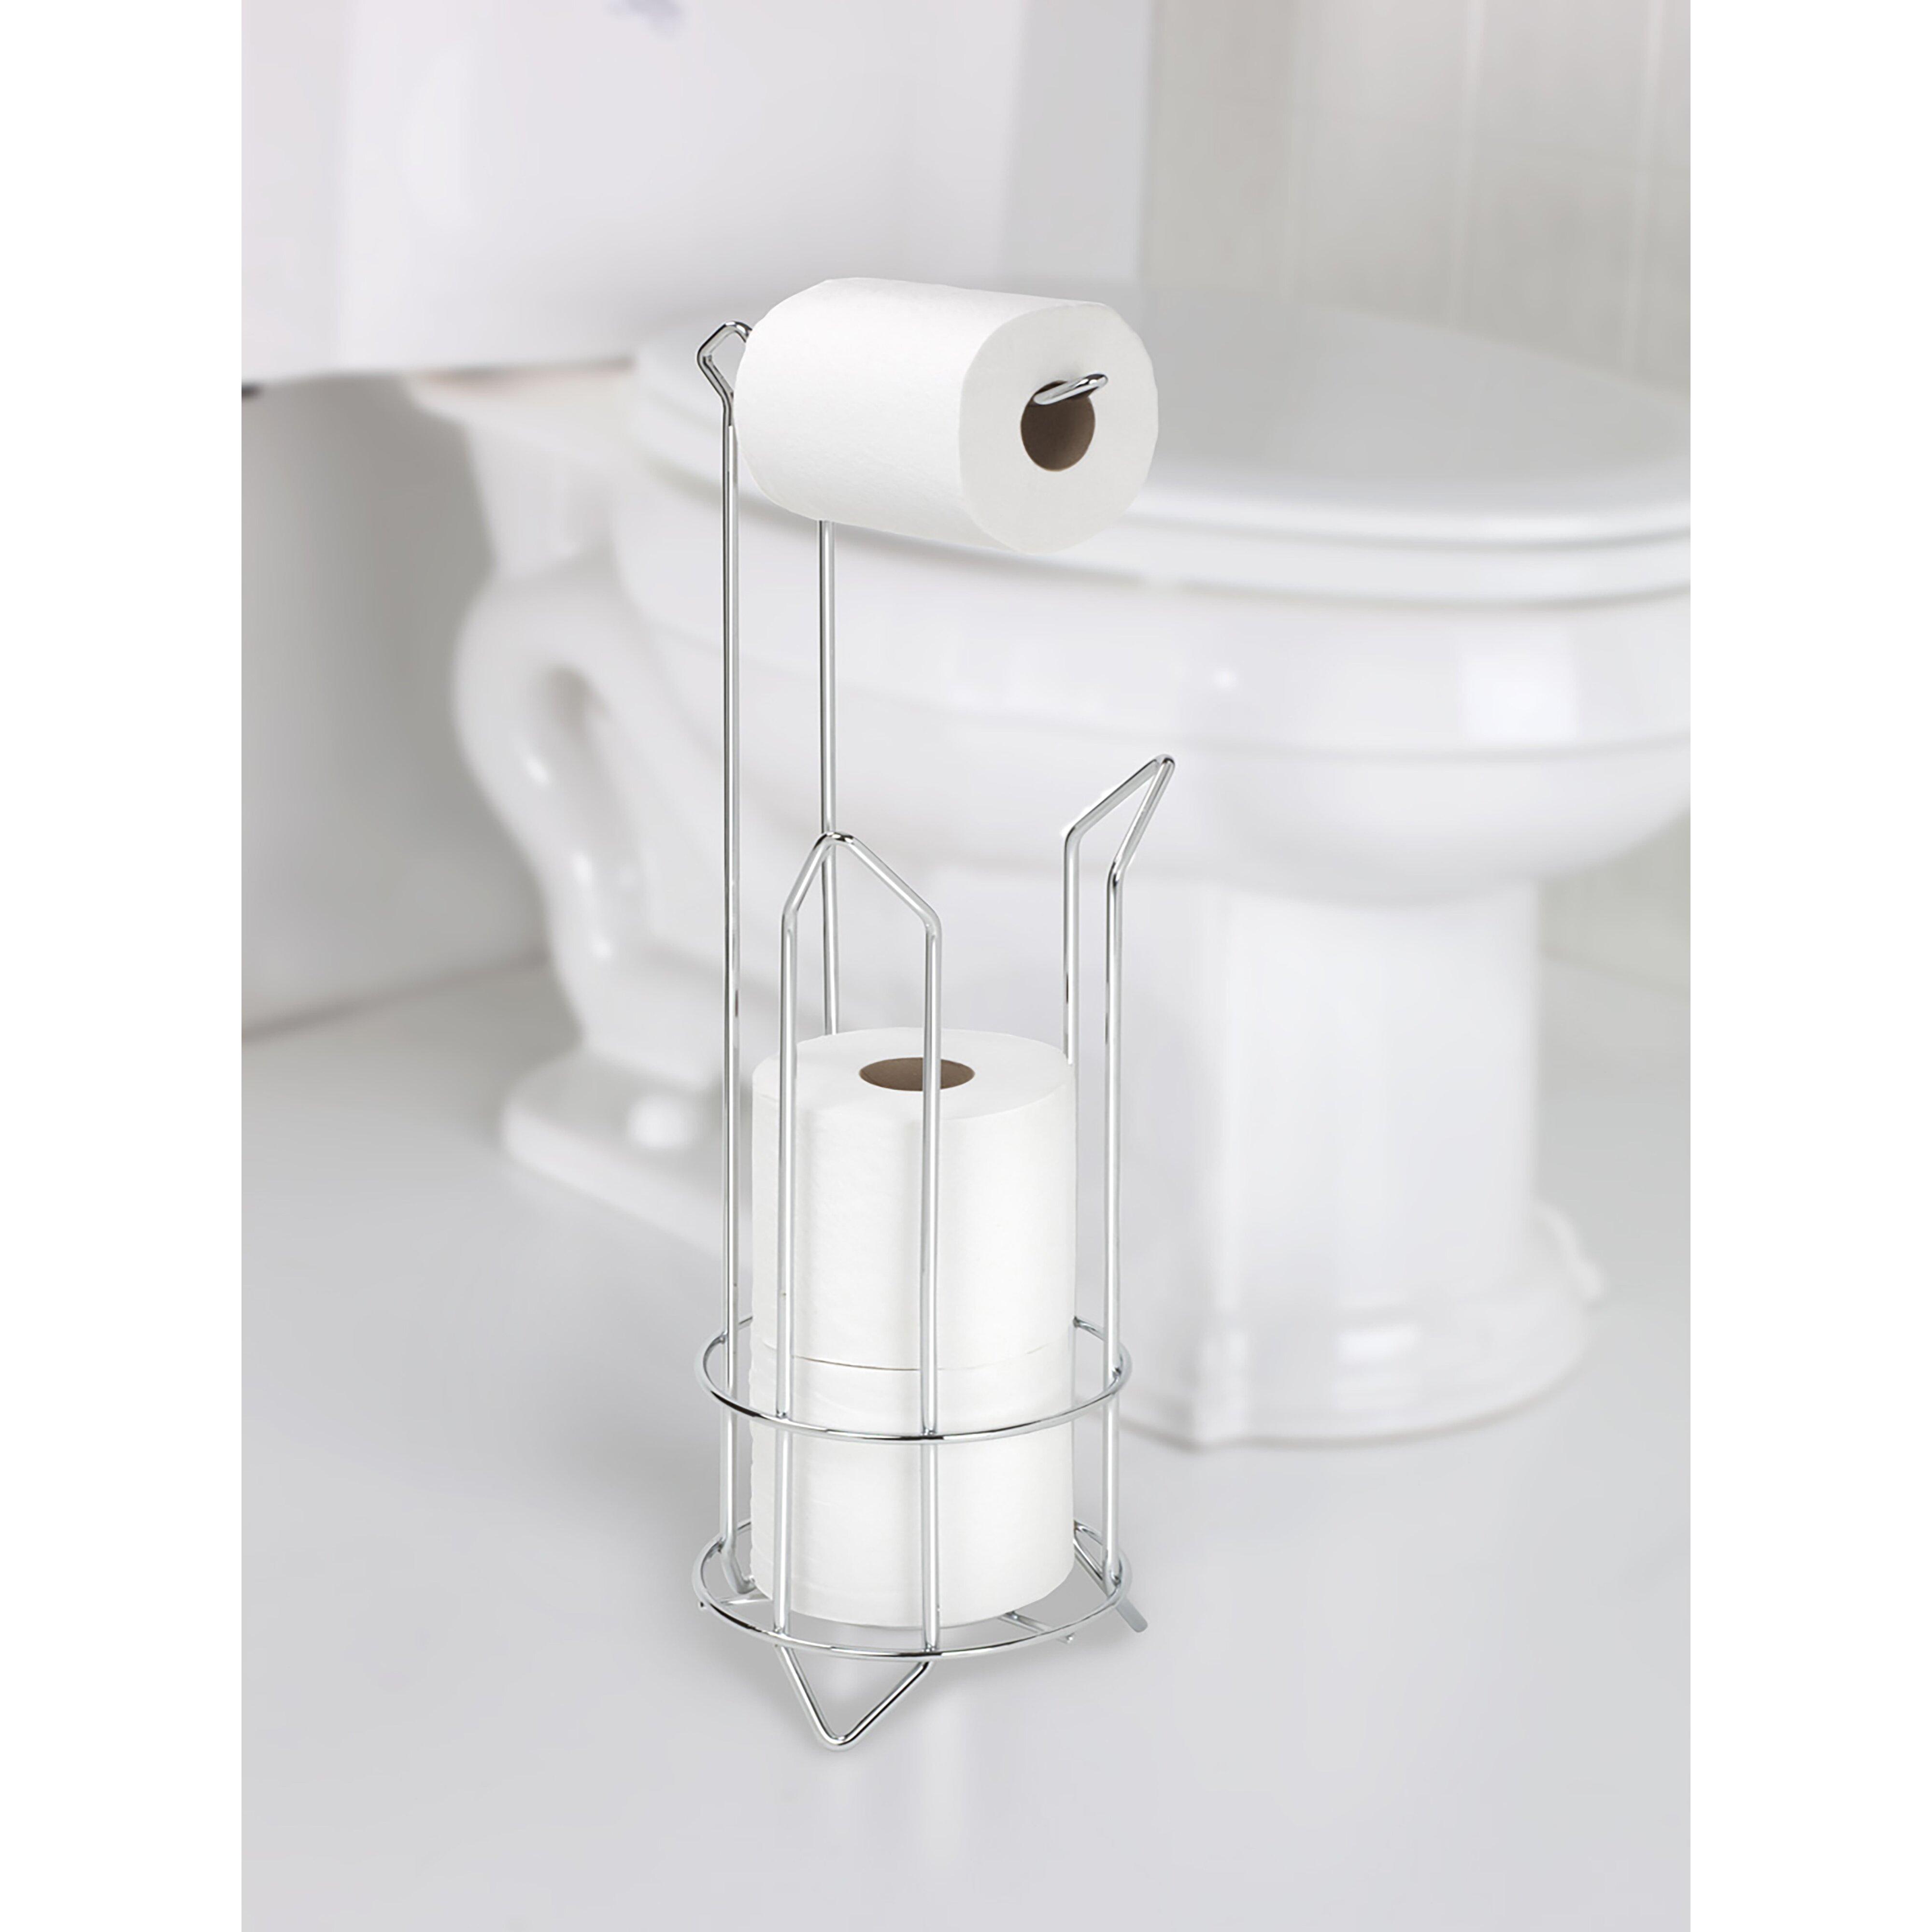 Kennedy international bath bliss free standing toilet - Bathroom toilet paper holder free standing ...